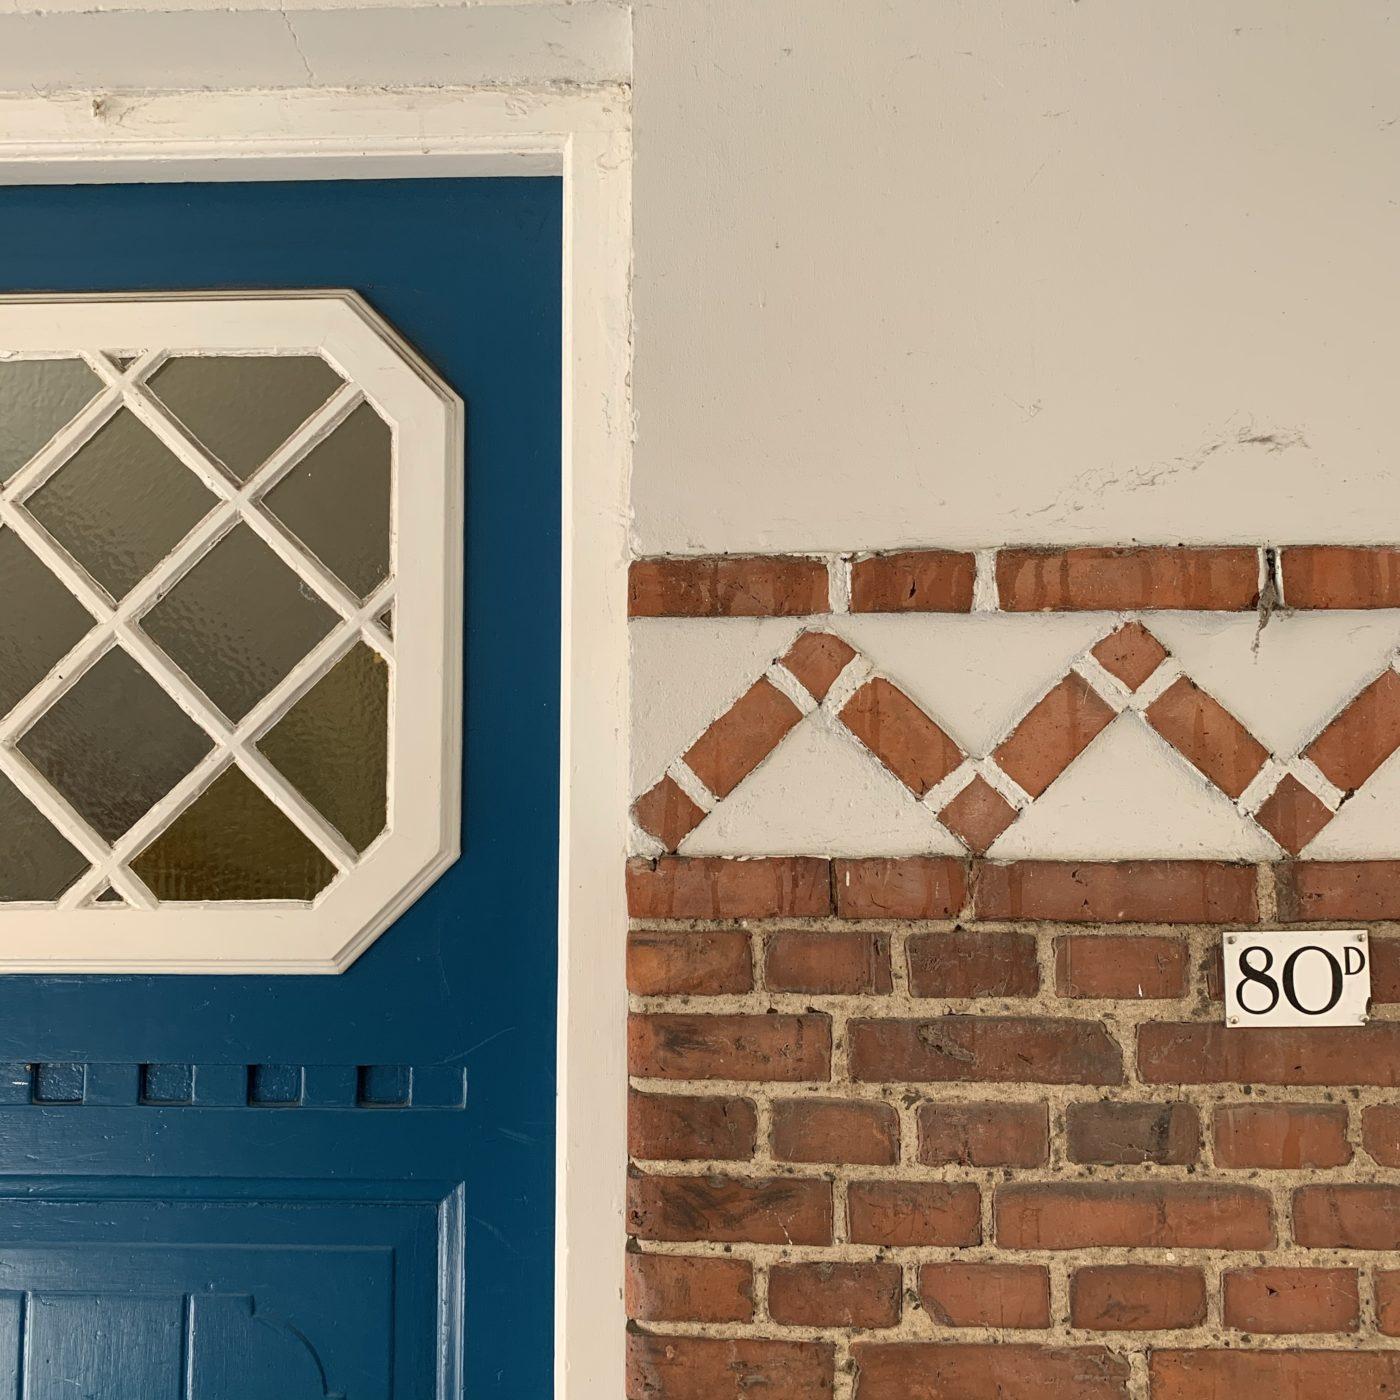 En blå dør med hvidt vindue, i en port med fine dekorative mursten og et skilt med nr. 80D.